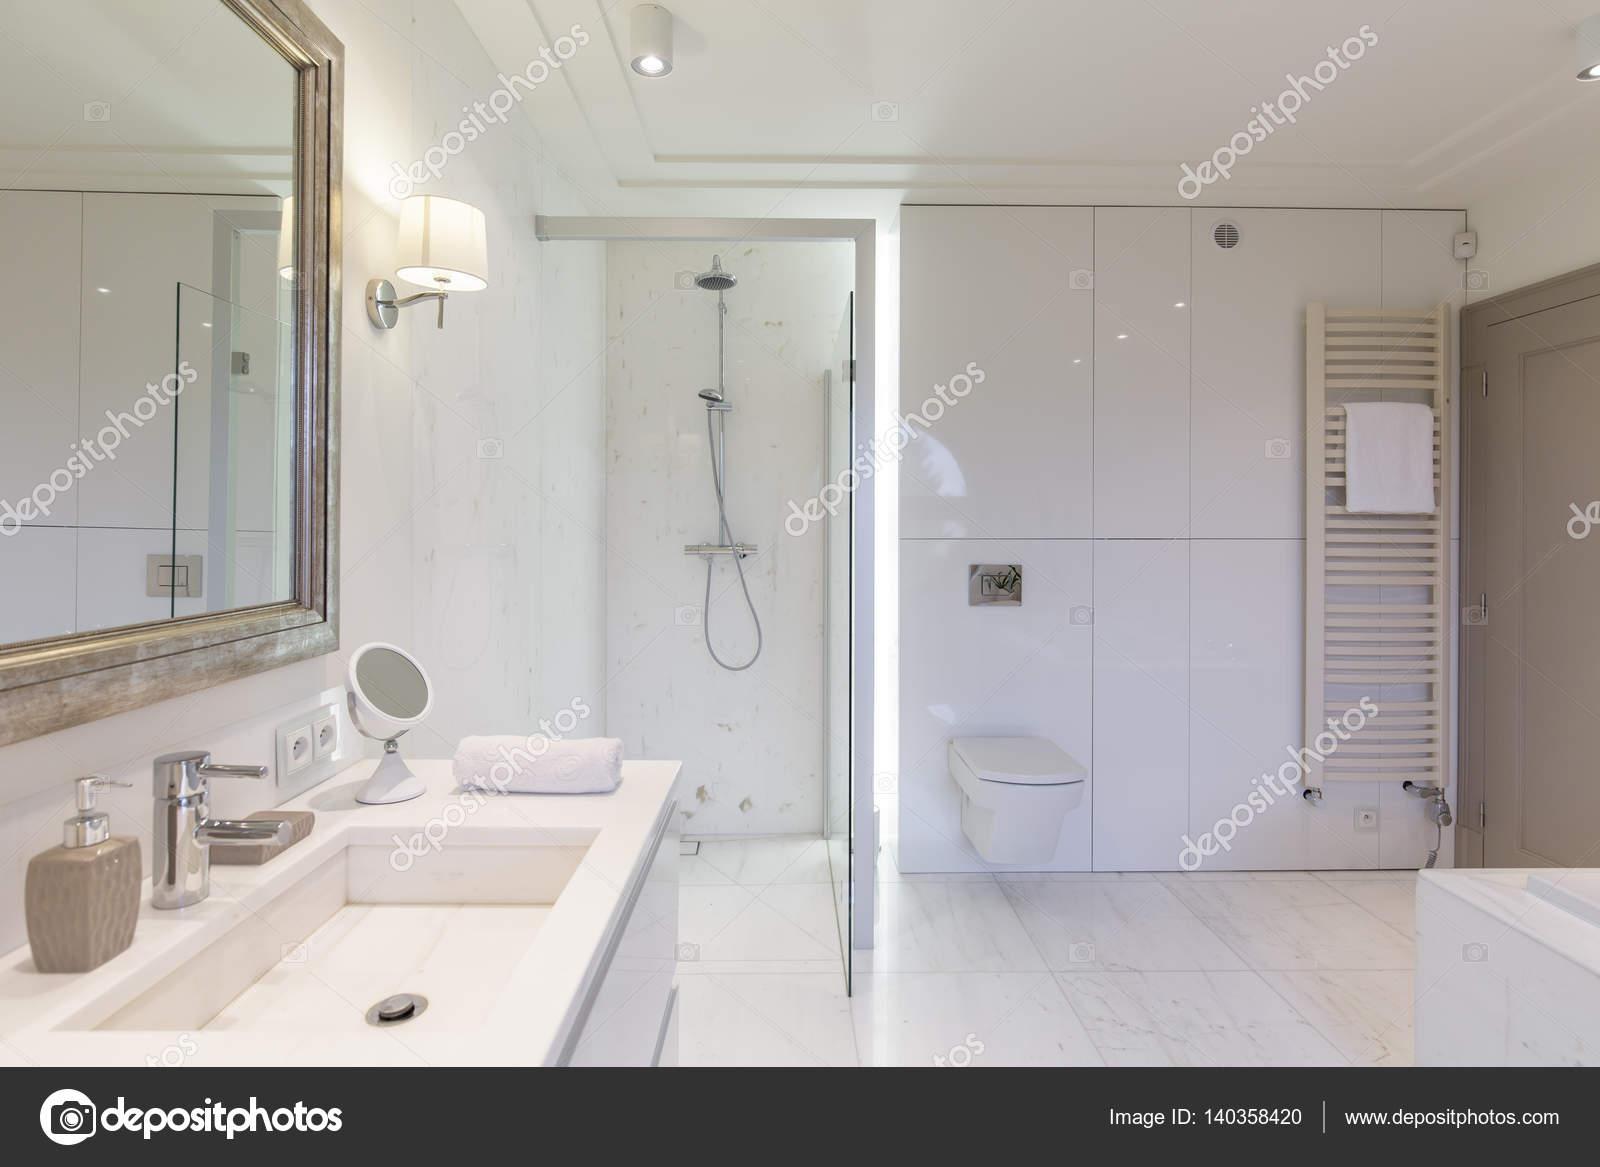 Bad glazen douchecabine loft badkamer moderne heldere zolder